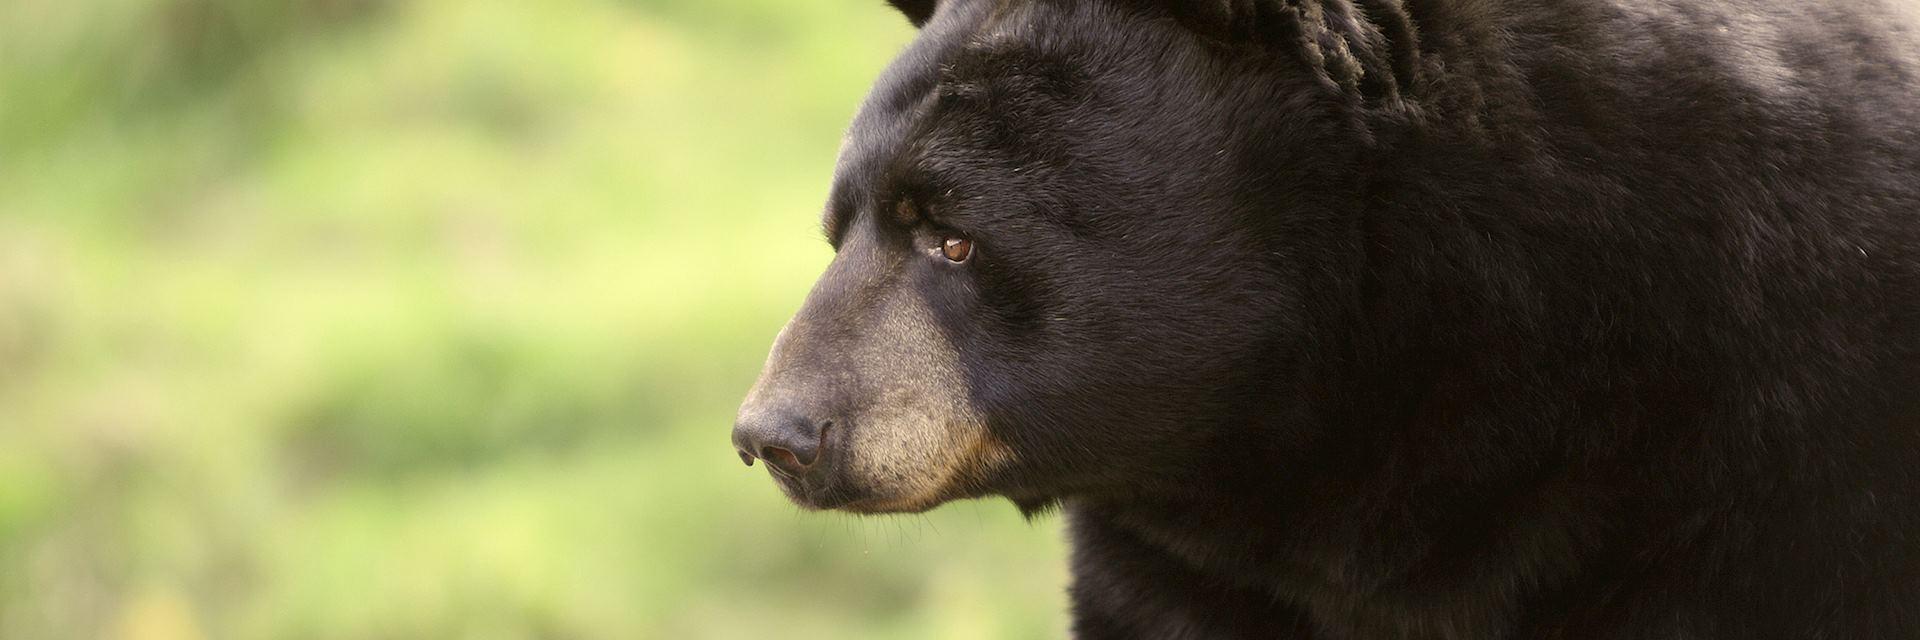 Black bear in Mastigouche Wildlife Reserve